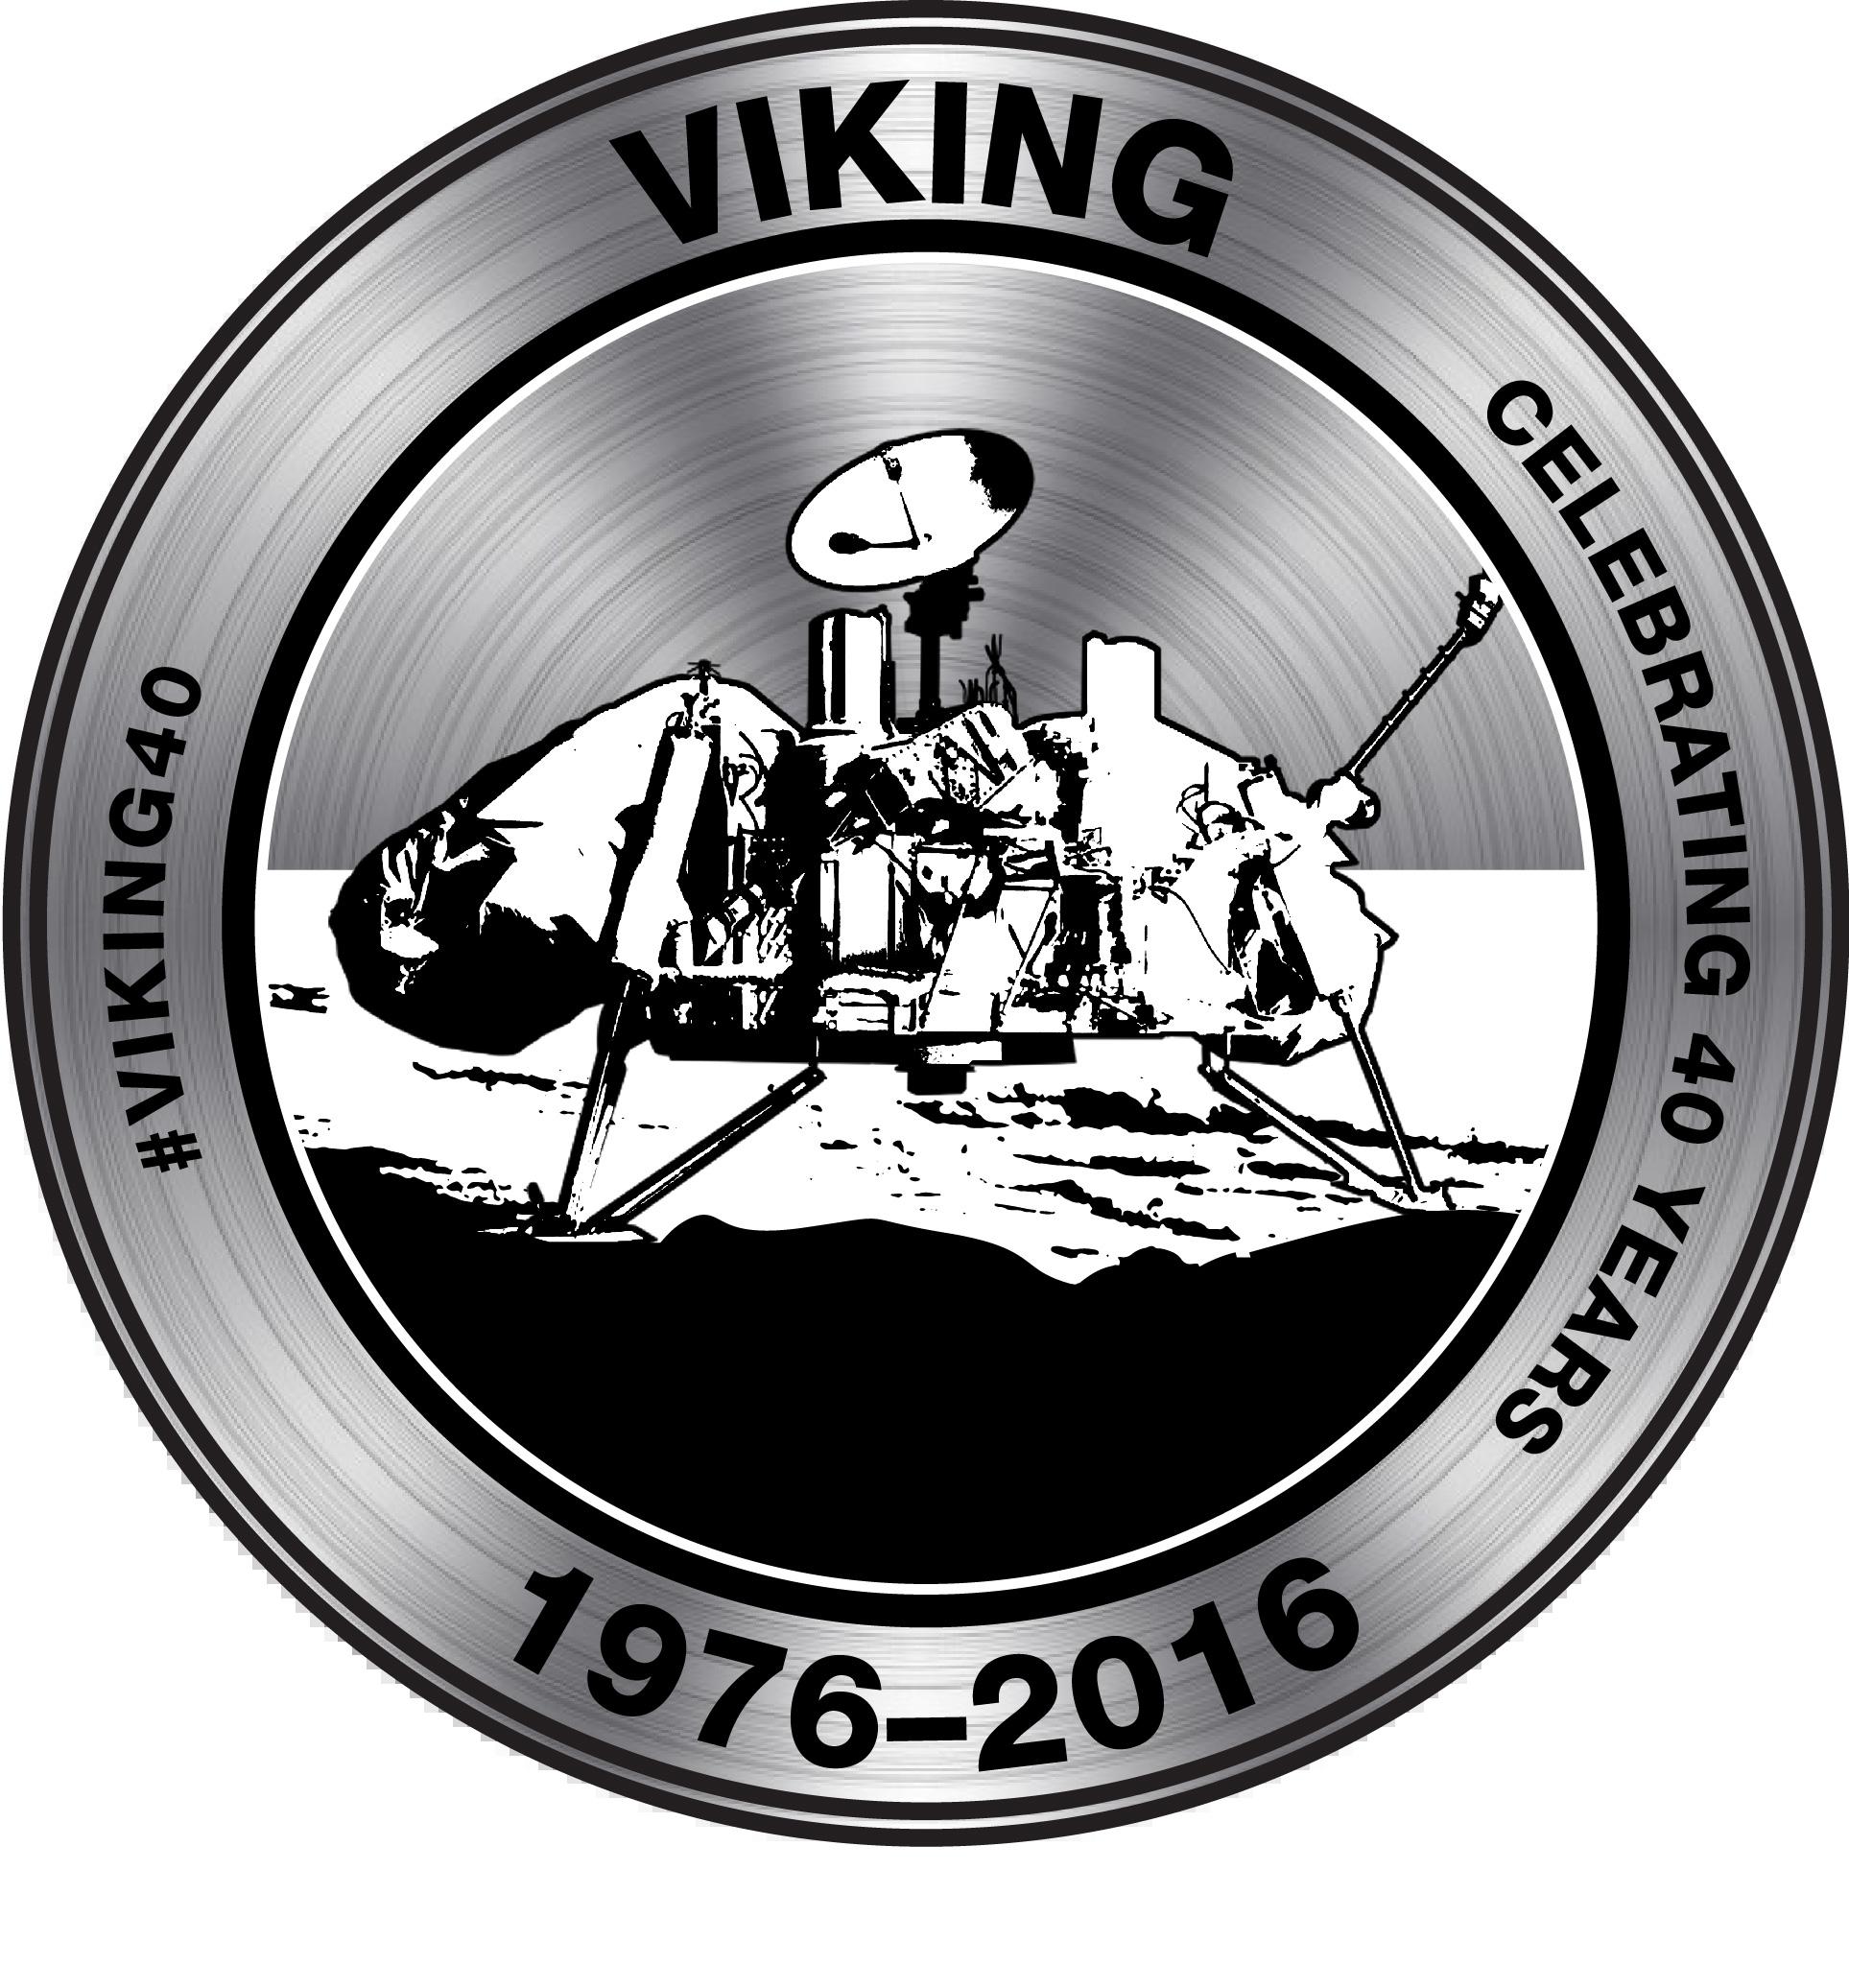 Viking 40 Year Anniversary Artwork Medal Nasas Mars Exploration